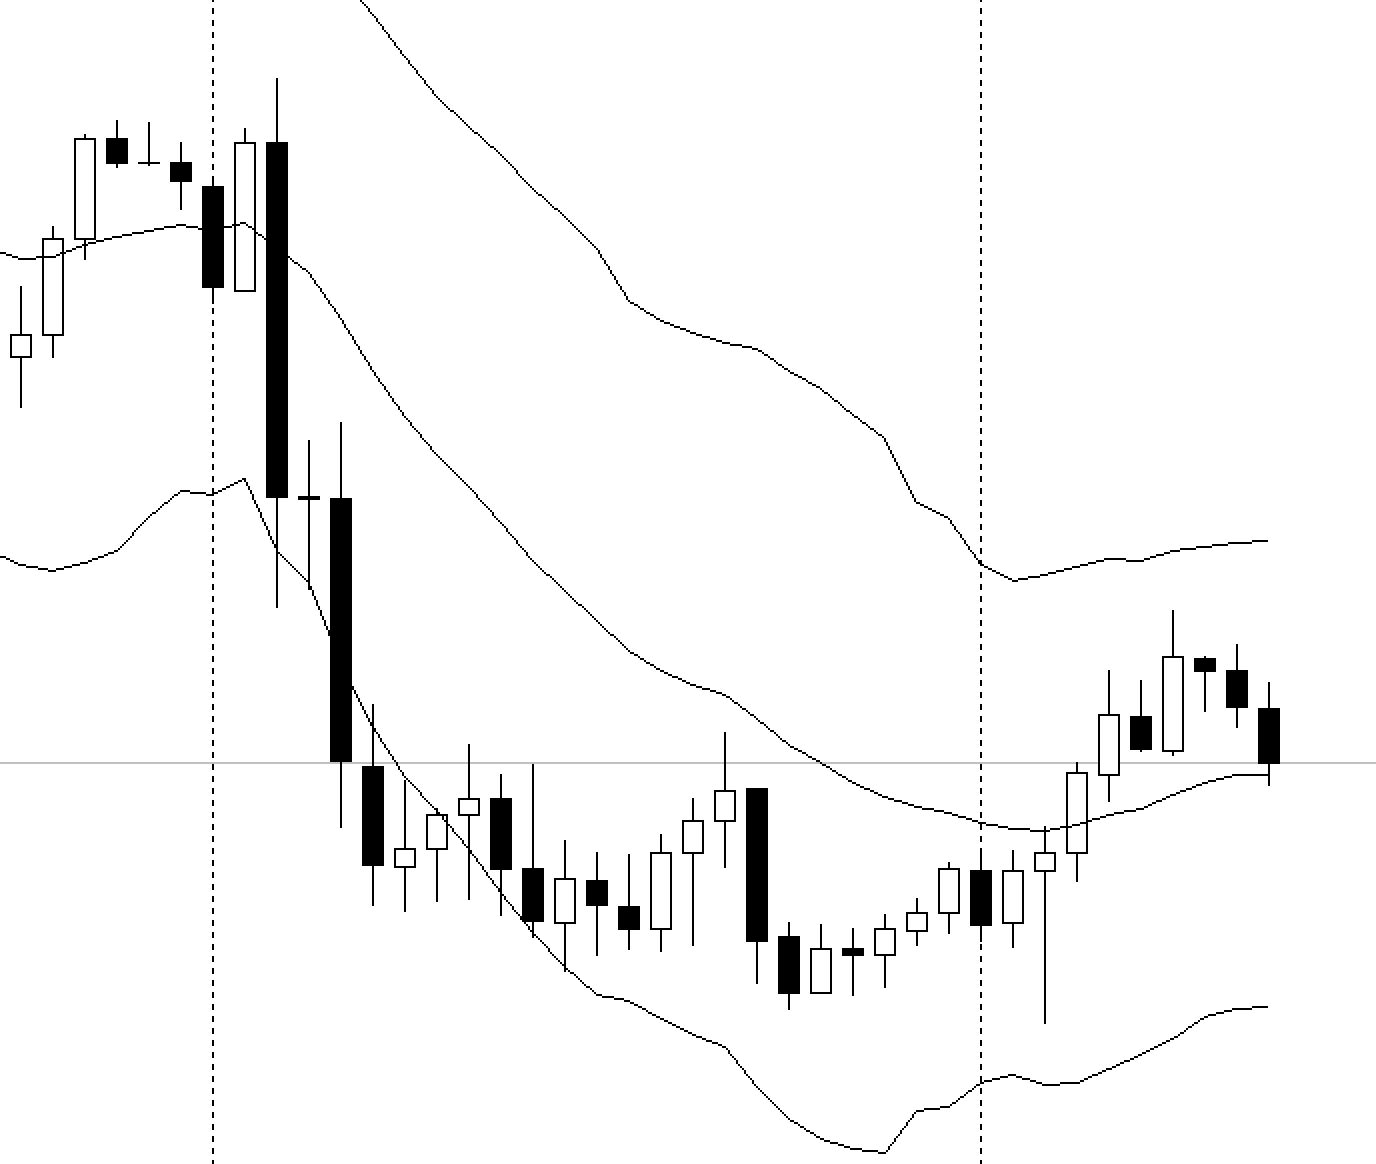 price-action-chuyen-sau-traderviet40.